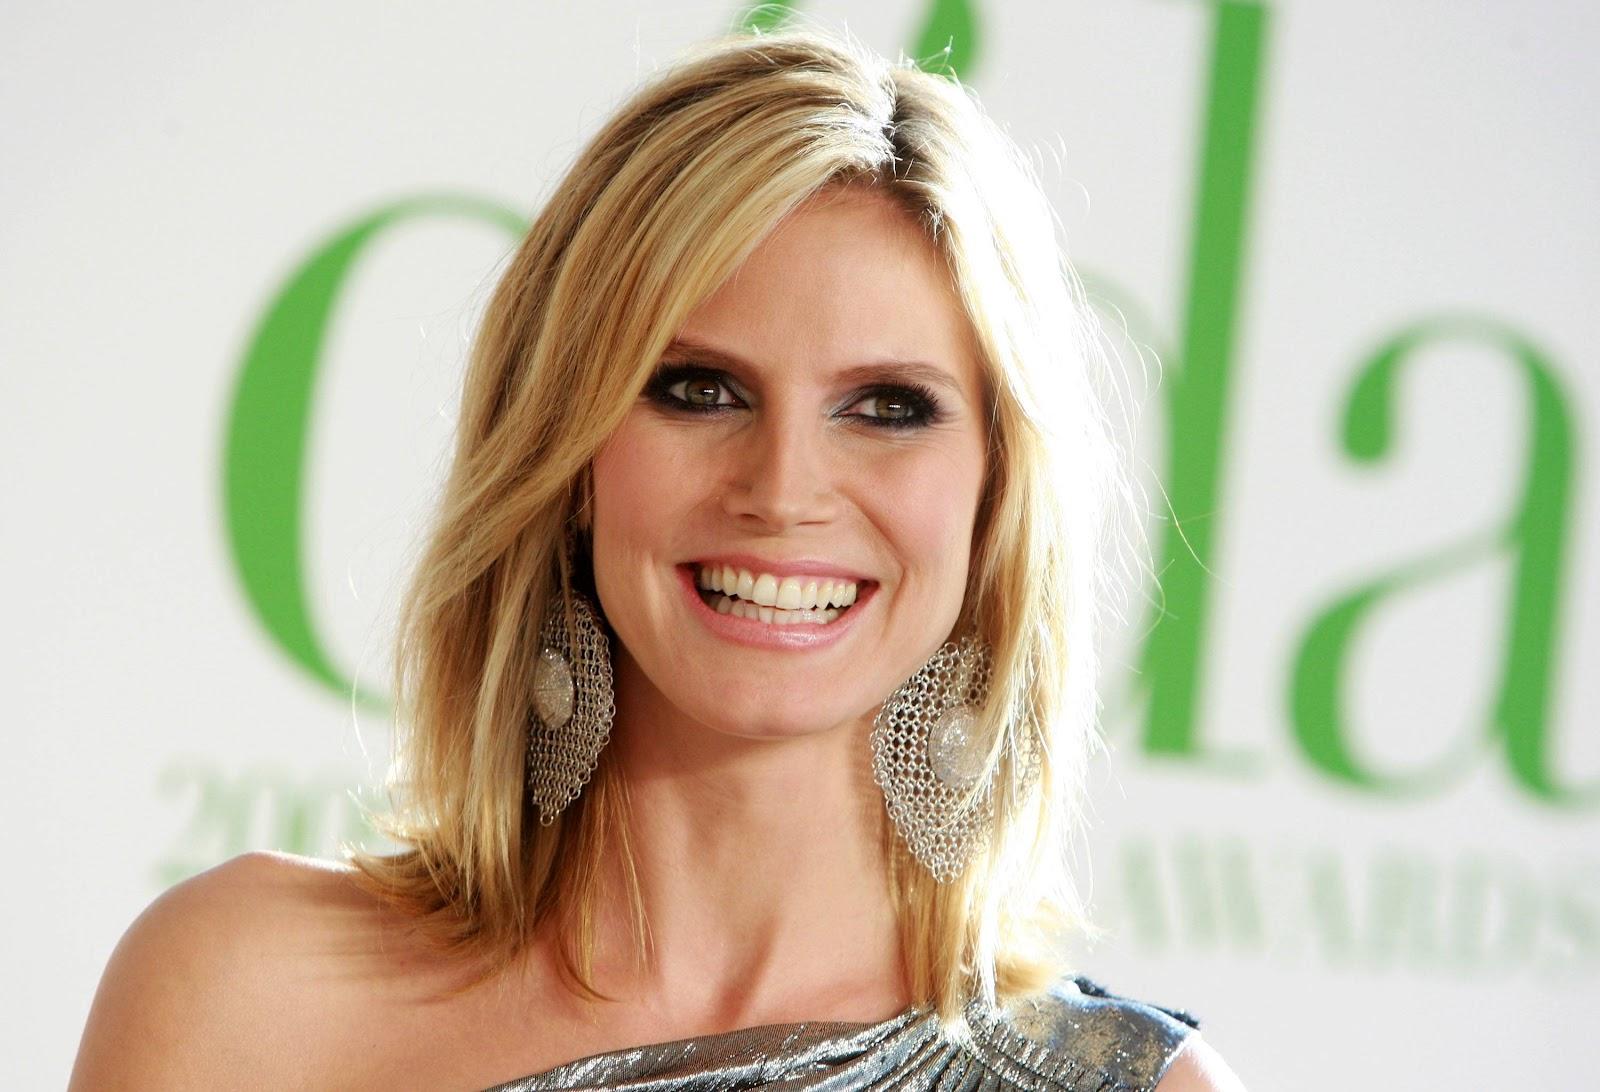 http://1.bp.blogspot.com/-V8K0ERQAe-I/UG4uKqGLx4I/AAAAAAAAASA/7AGmqv-mmHI/s1600/round_face_long_hairstyles_Heidi_Klum_hair.jpg